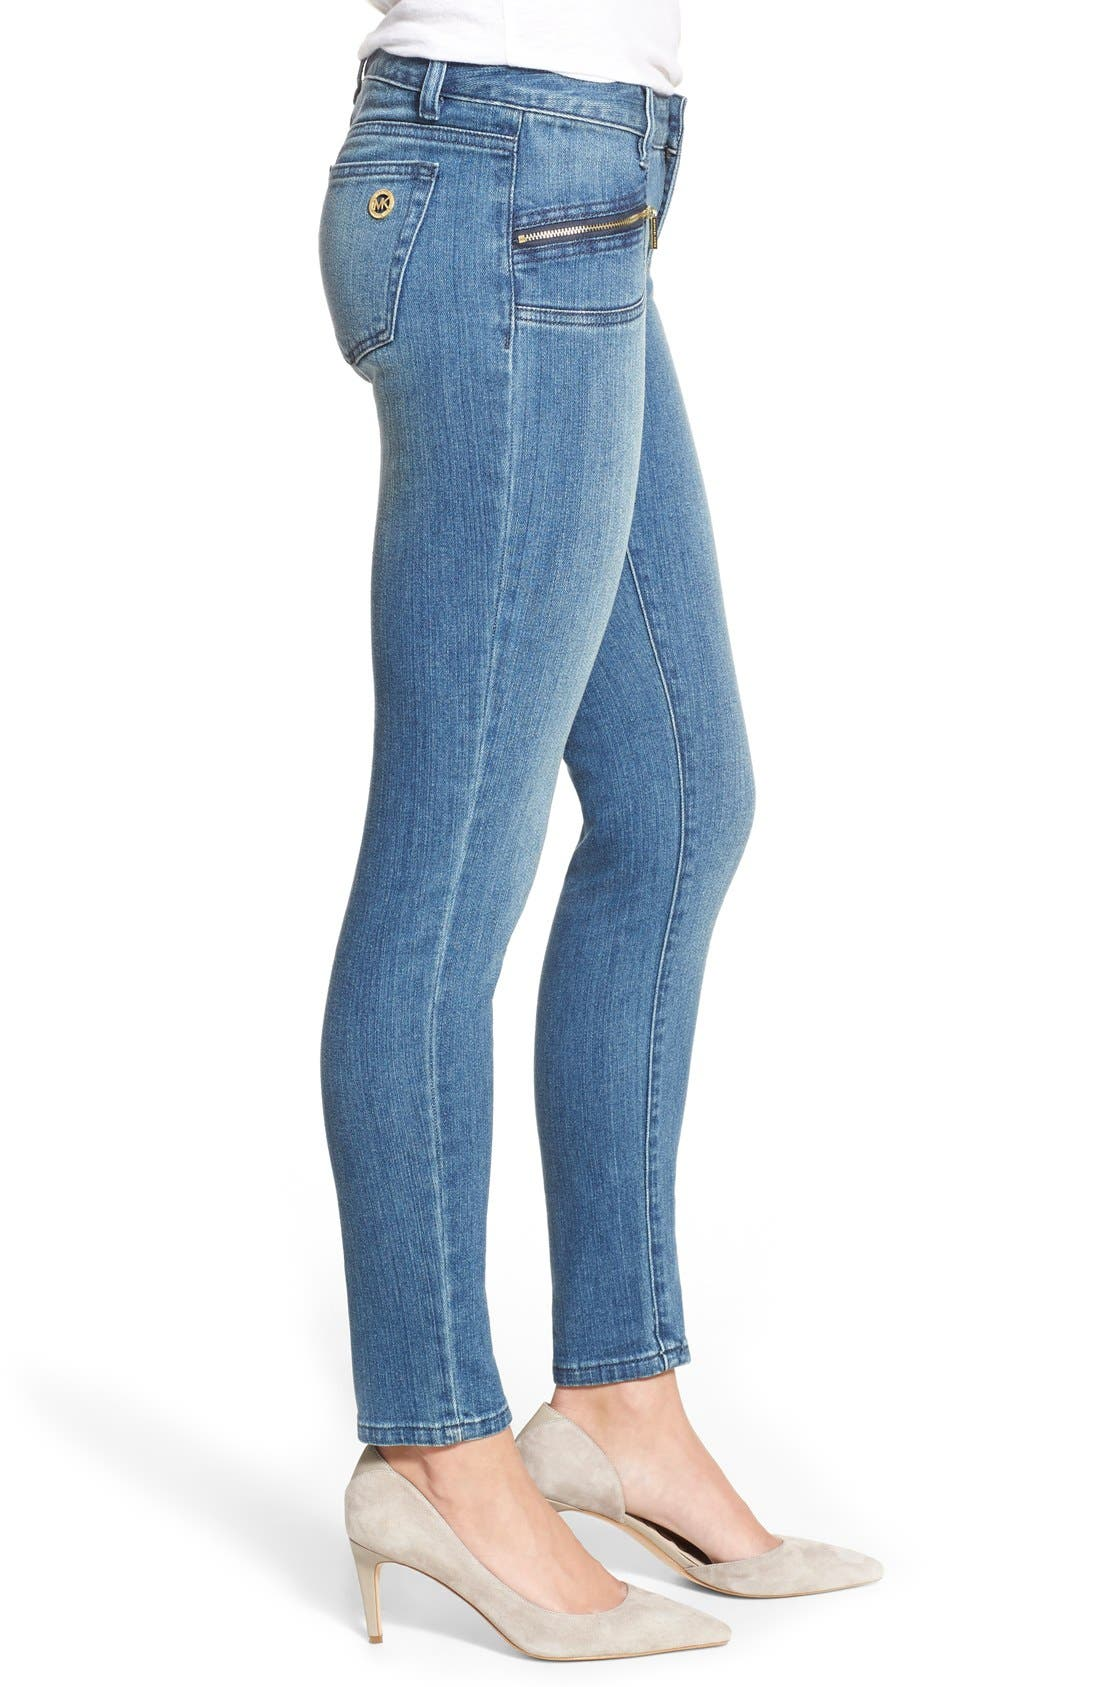 Alternate Image 3  - MICHAEL Michael KorsStretch Zip Pocket Ankle Skinny Jeans(Veruschka)